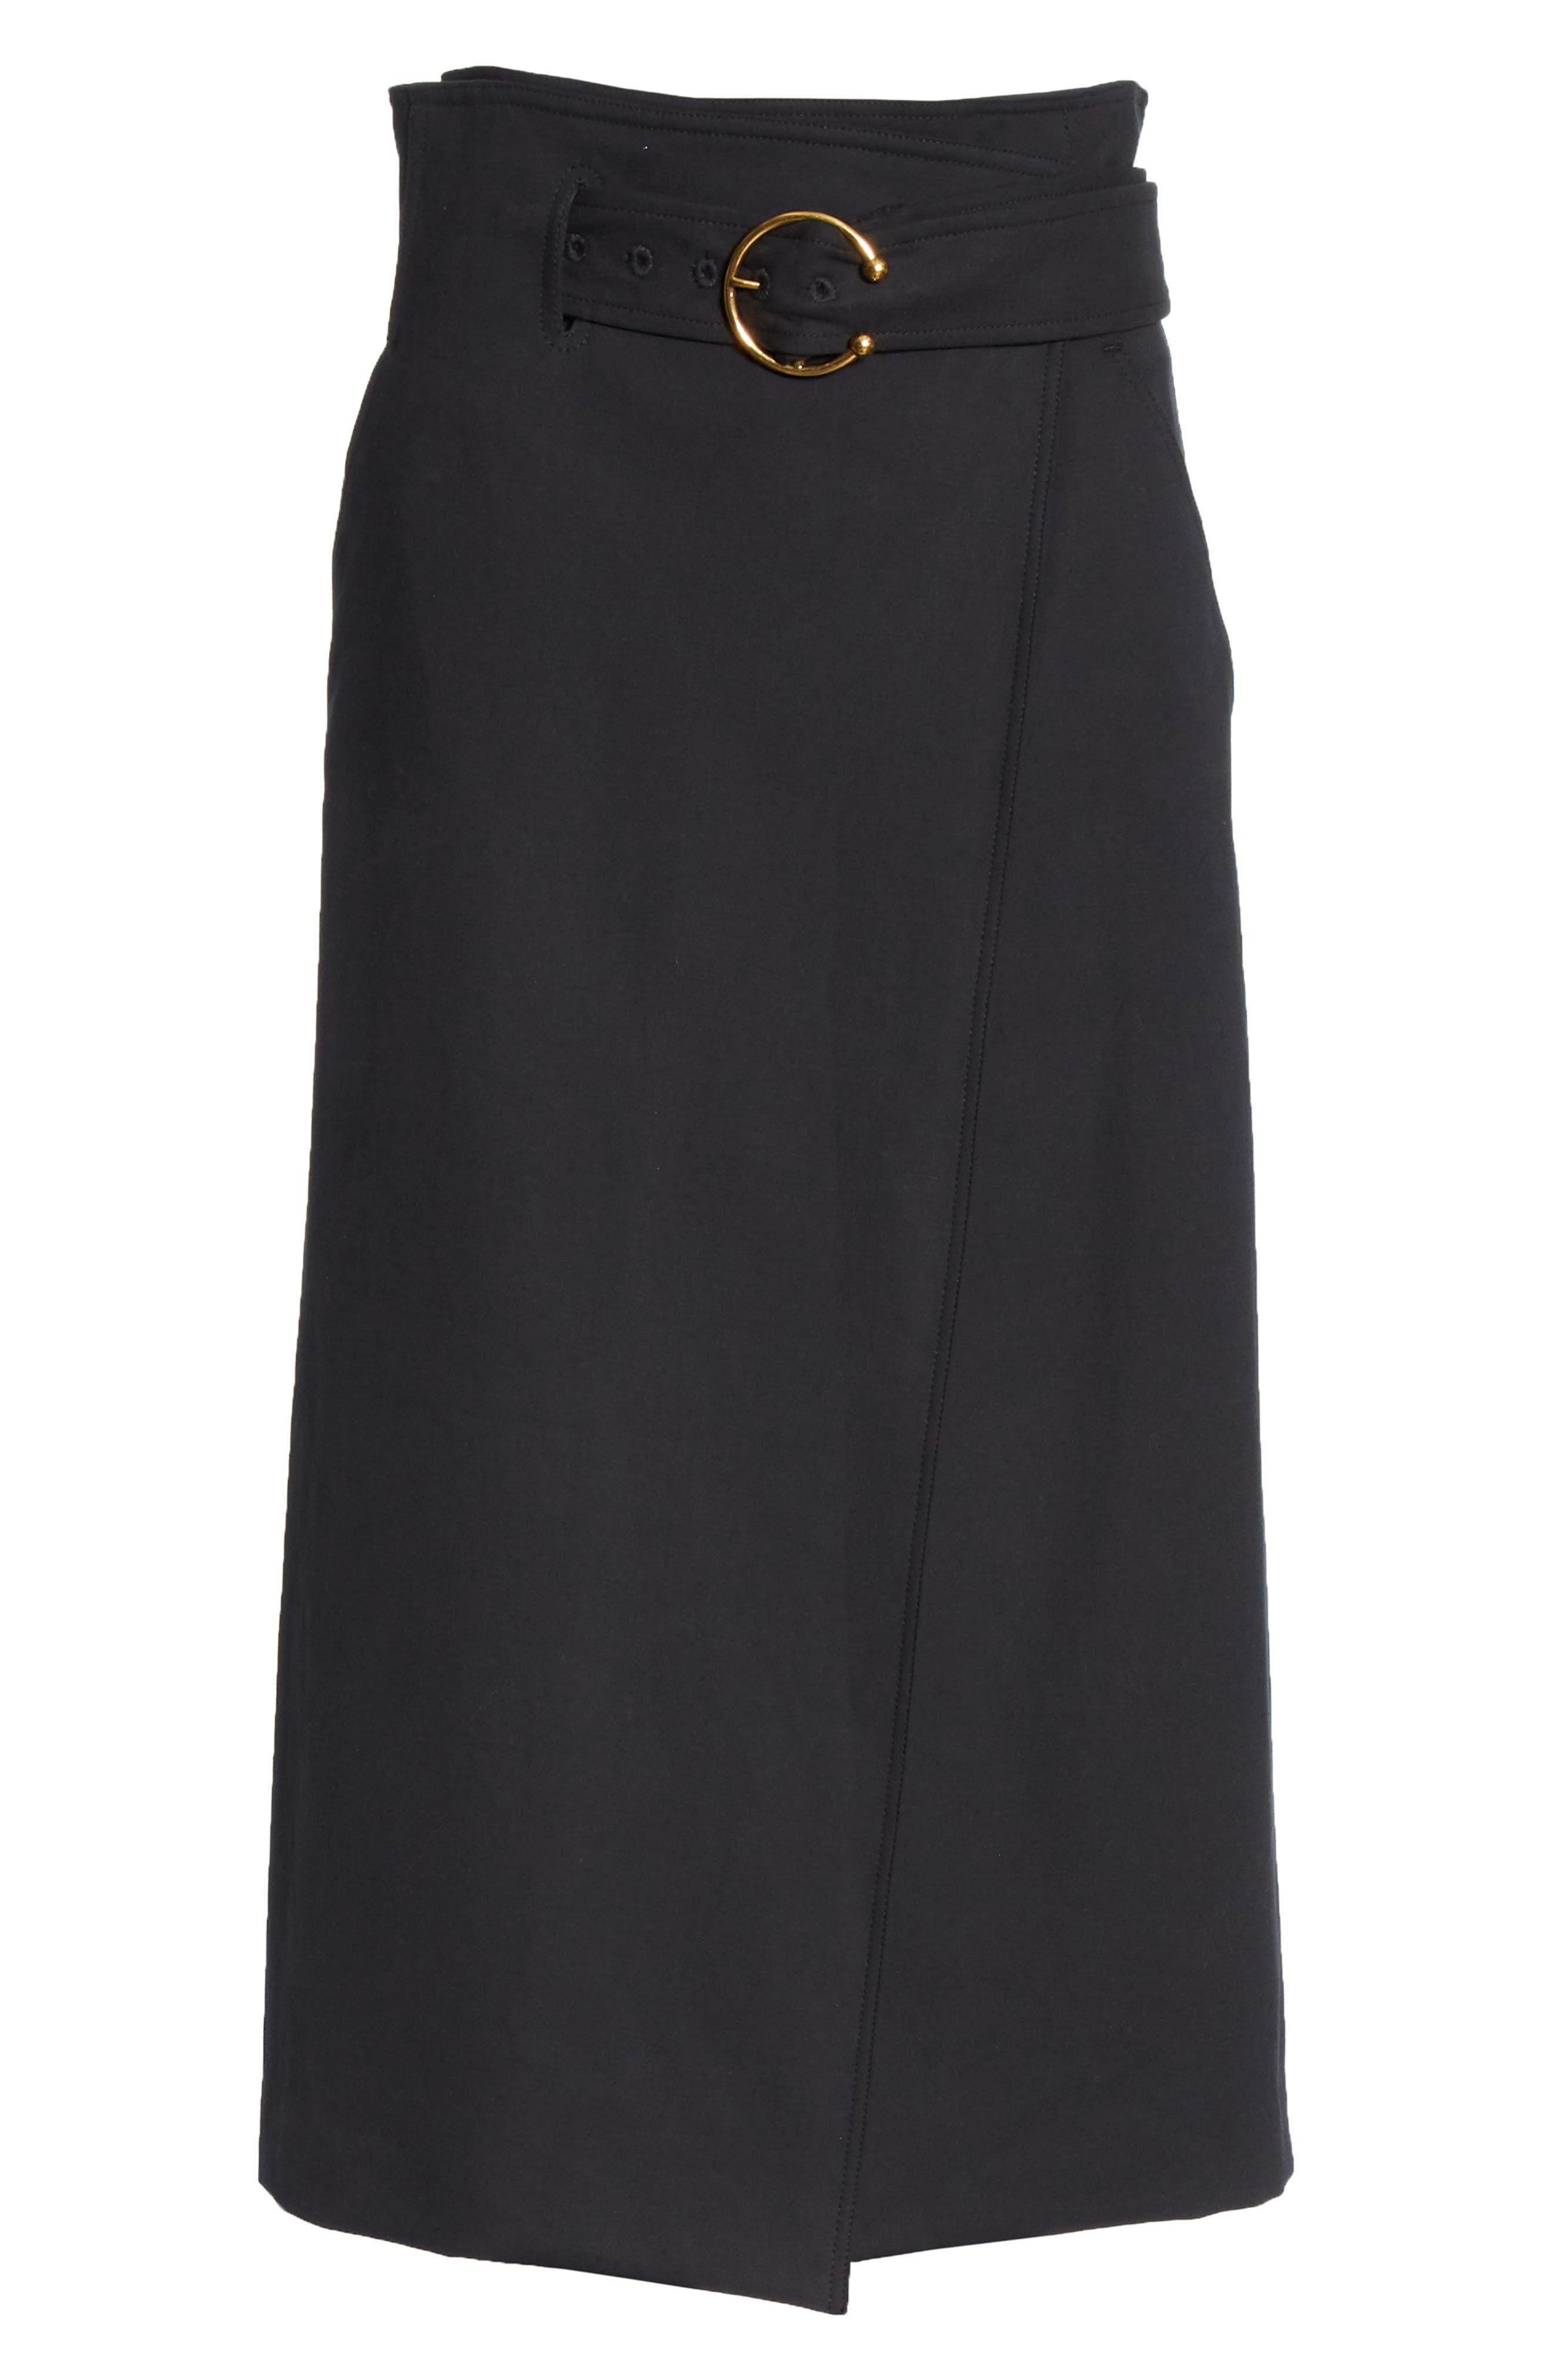 A.L.C., Aldridge Belted Midi Skirt, Alternate thumbnail 6, color, VINTAGE BLACK